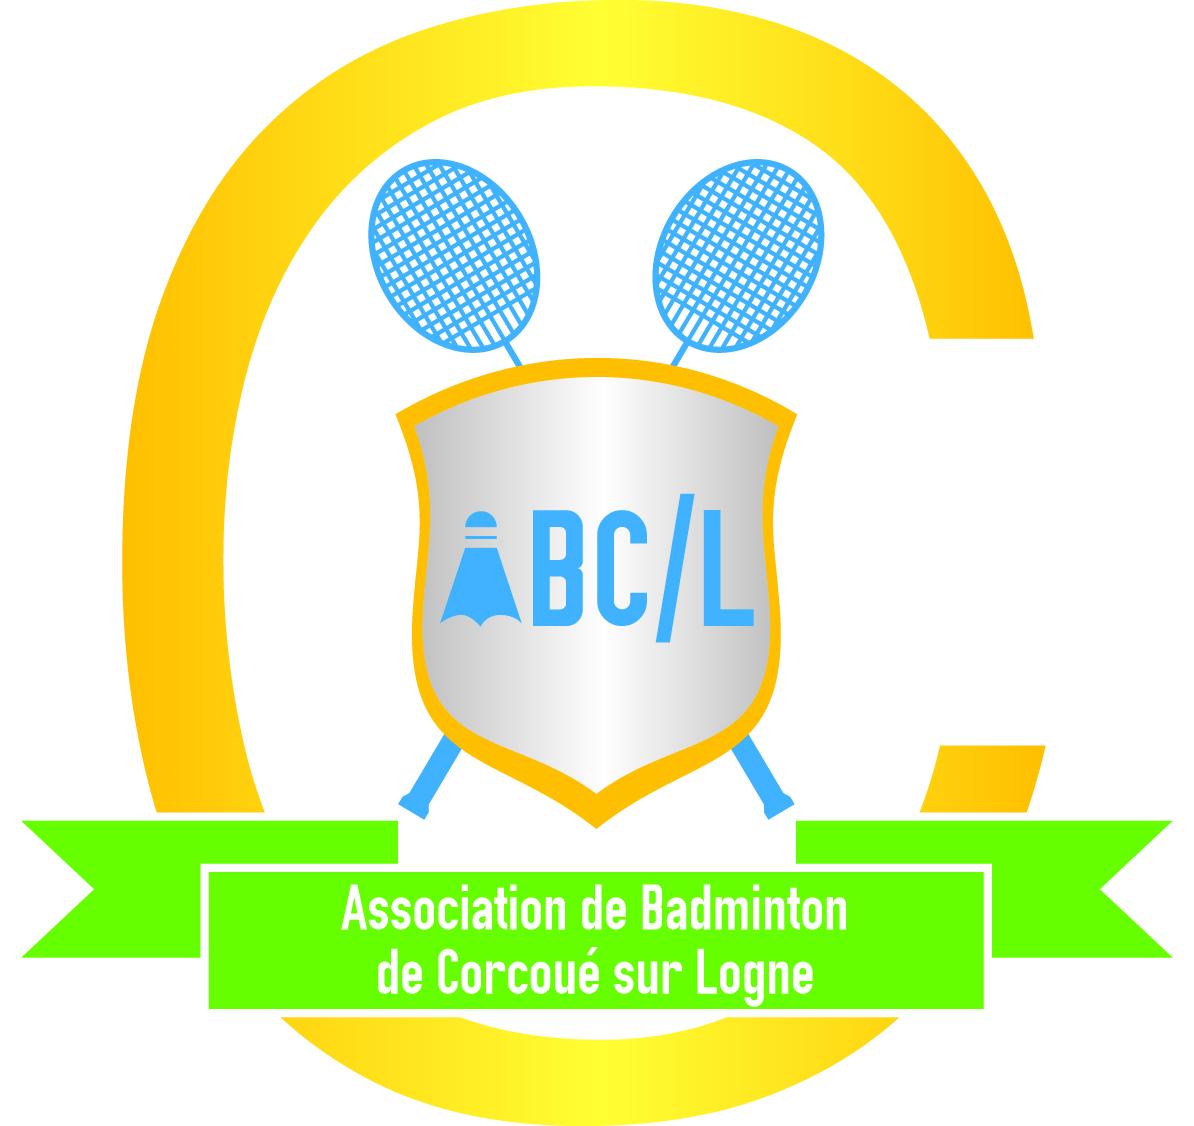 Logoabcl 4